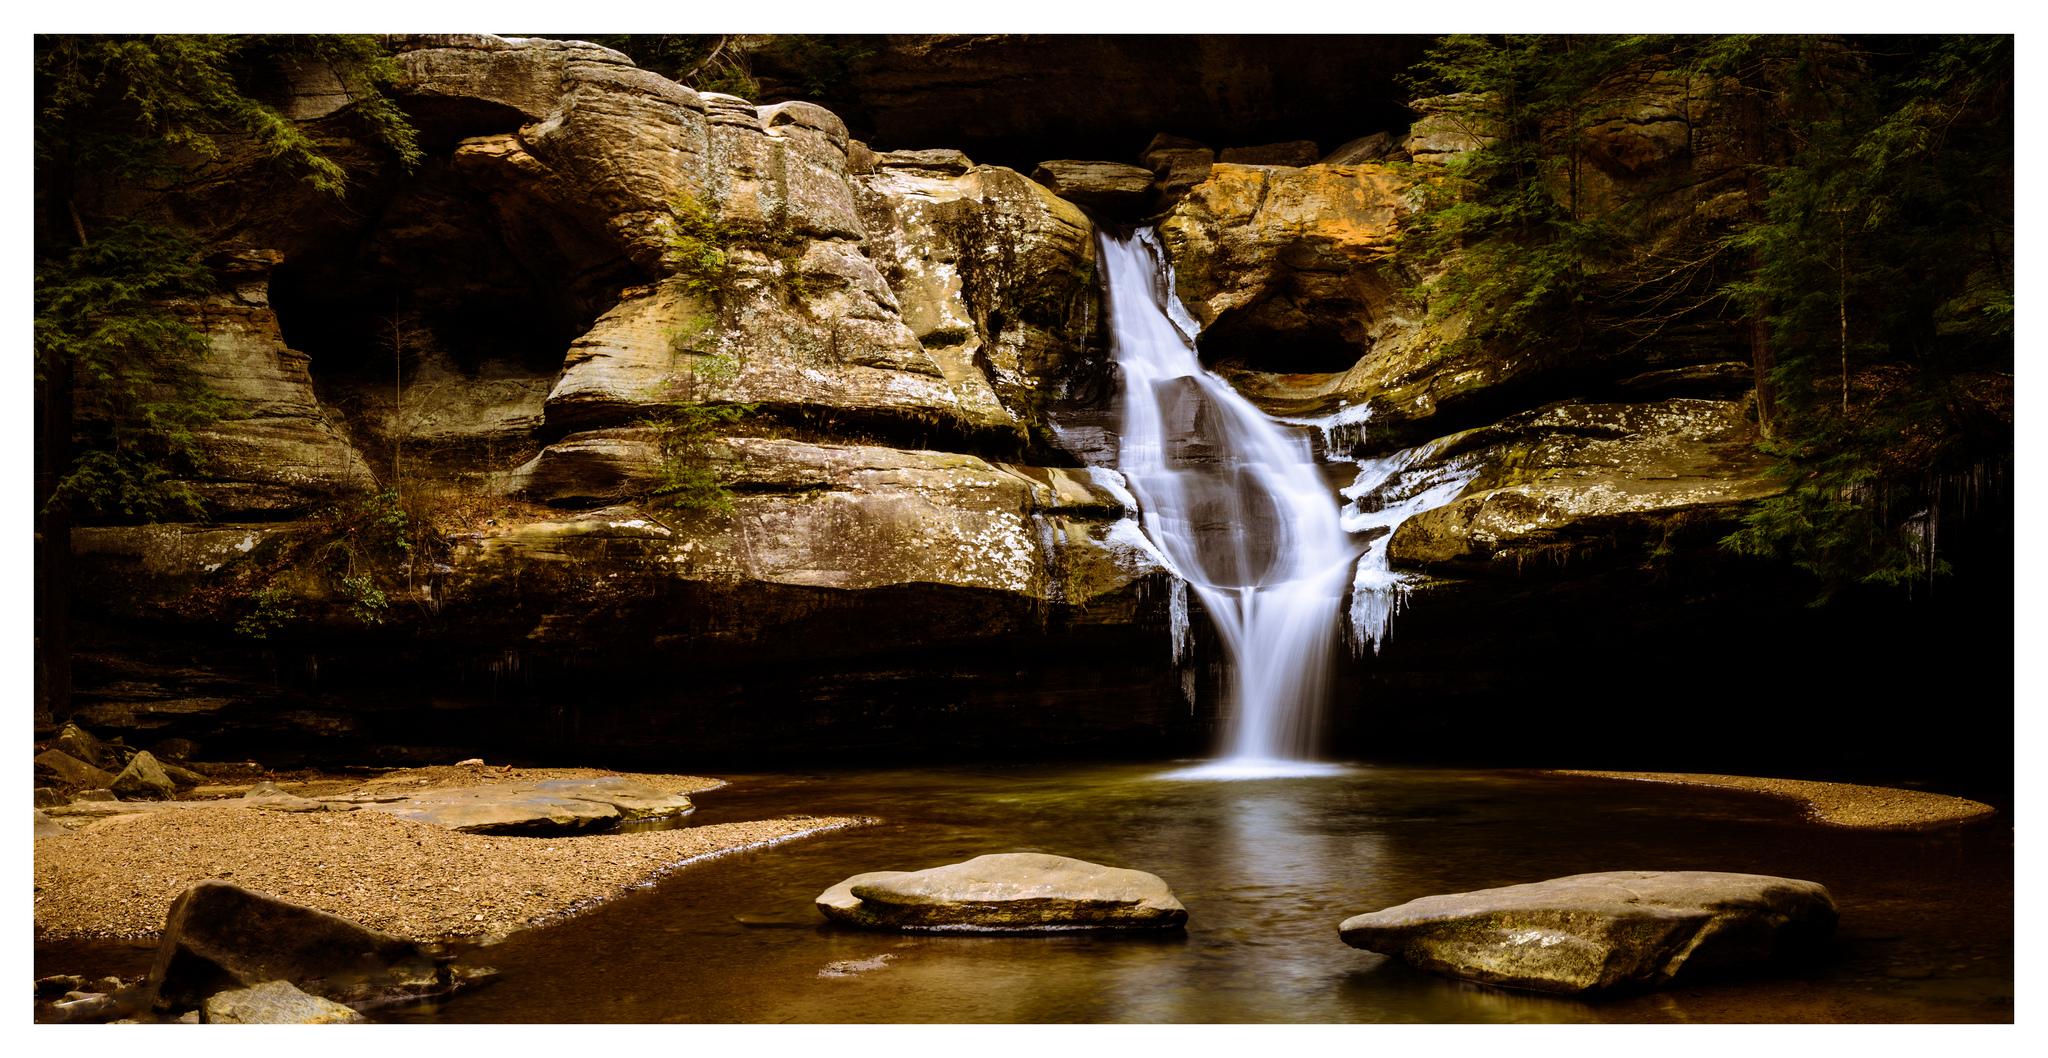 Cedar Falls - Multi-Image Pano Stich - Nikon D750